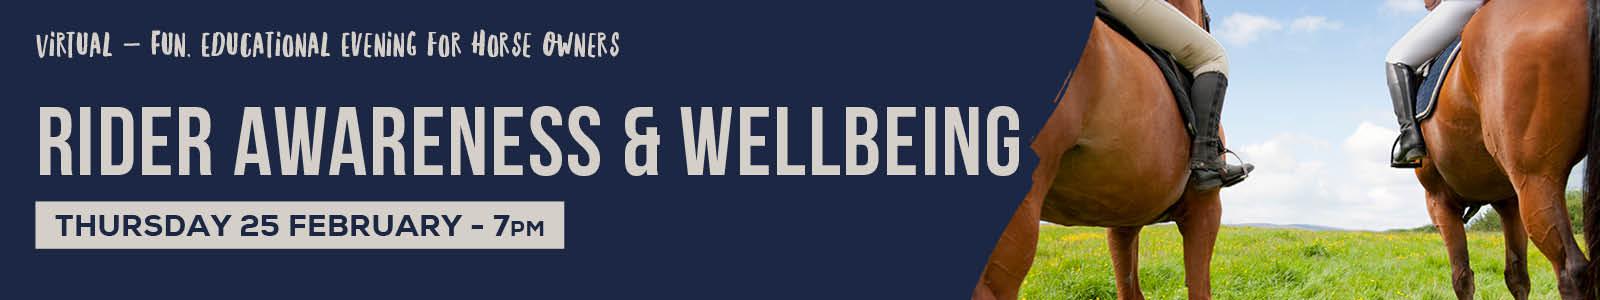 Rider Awareness & Wellbeing 92034